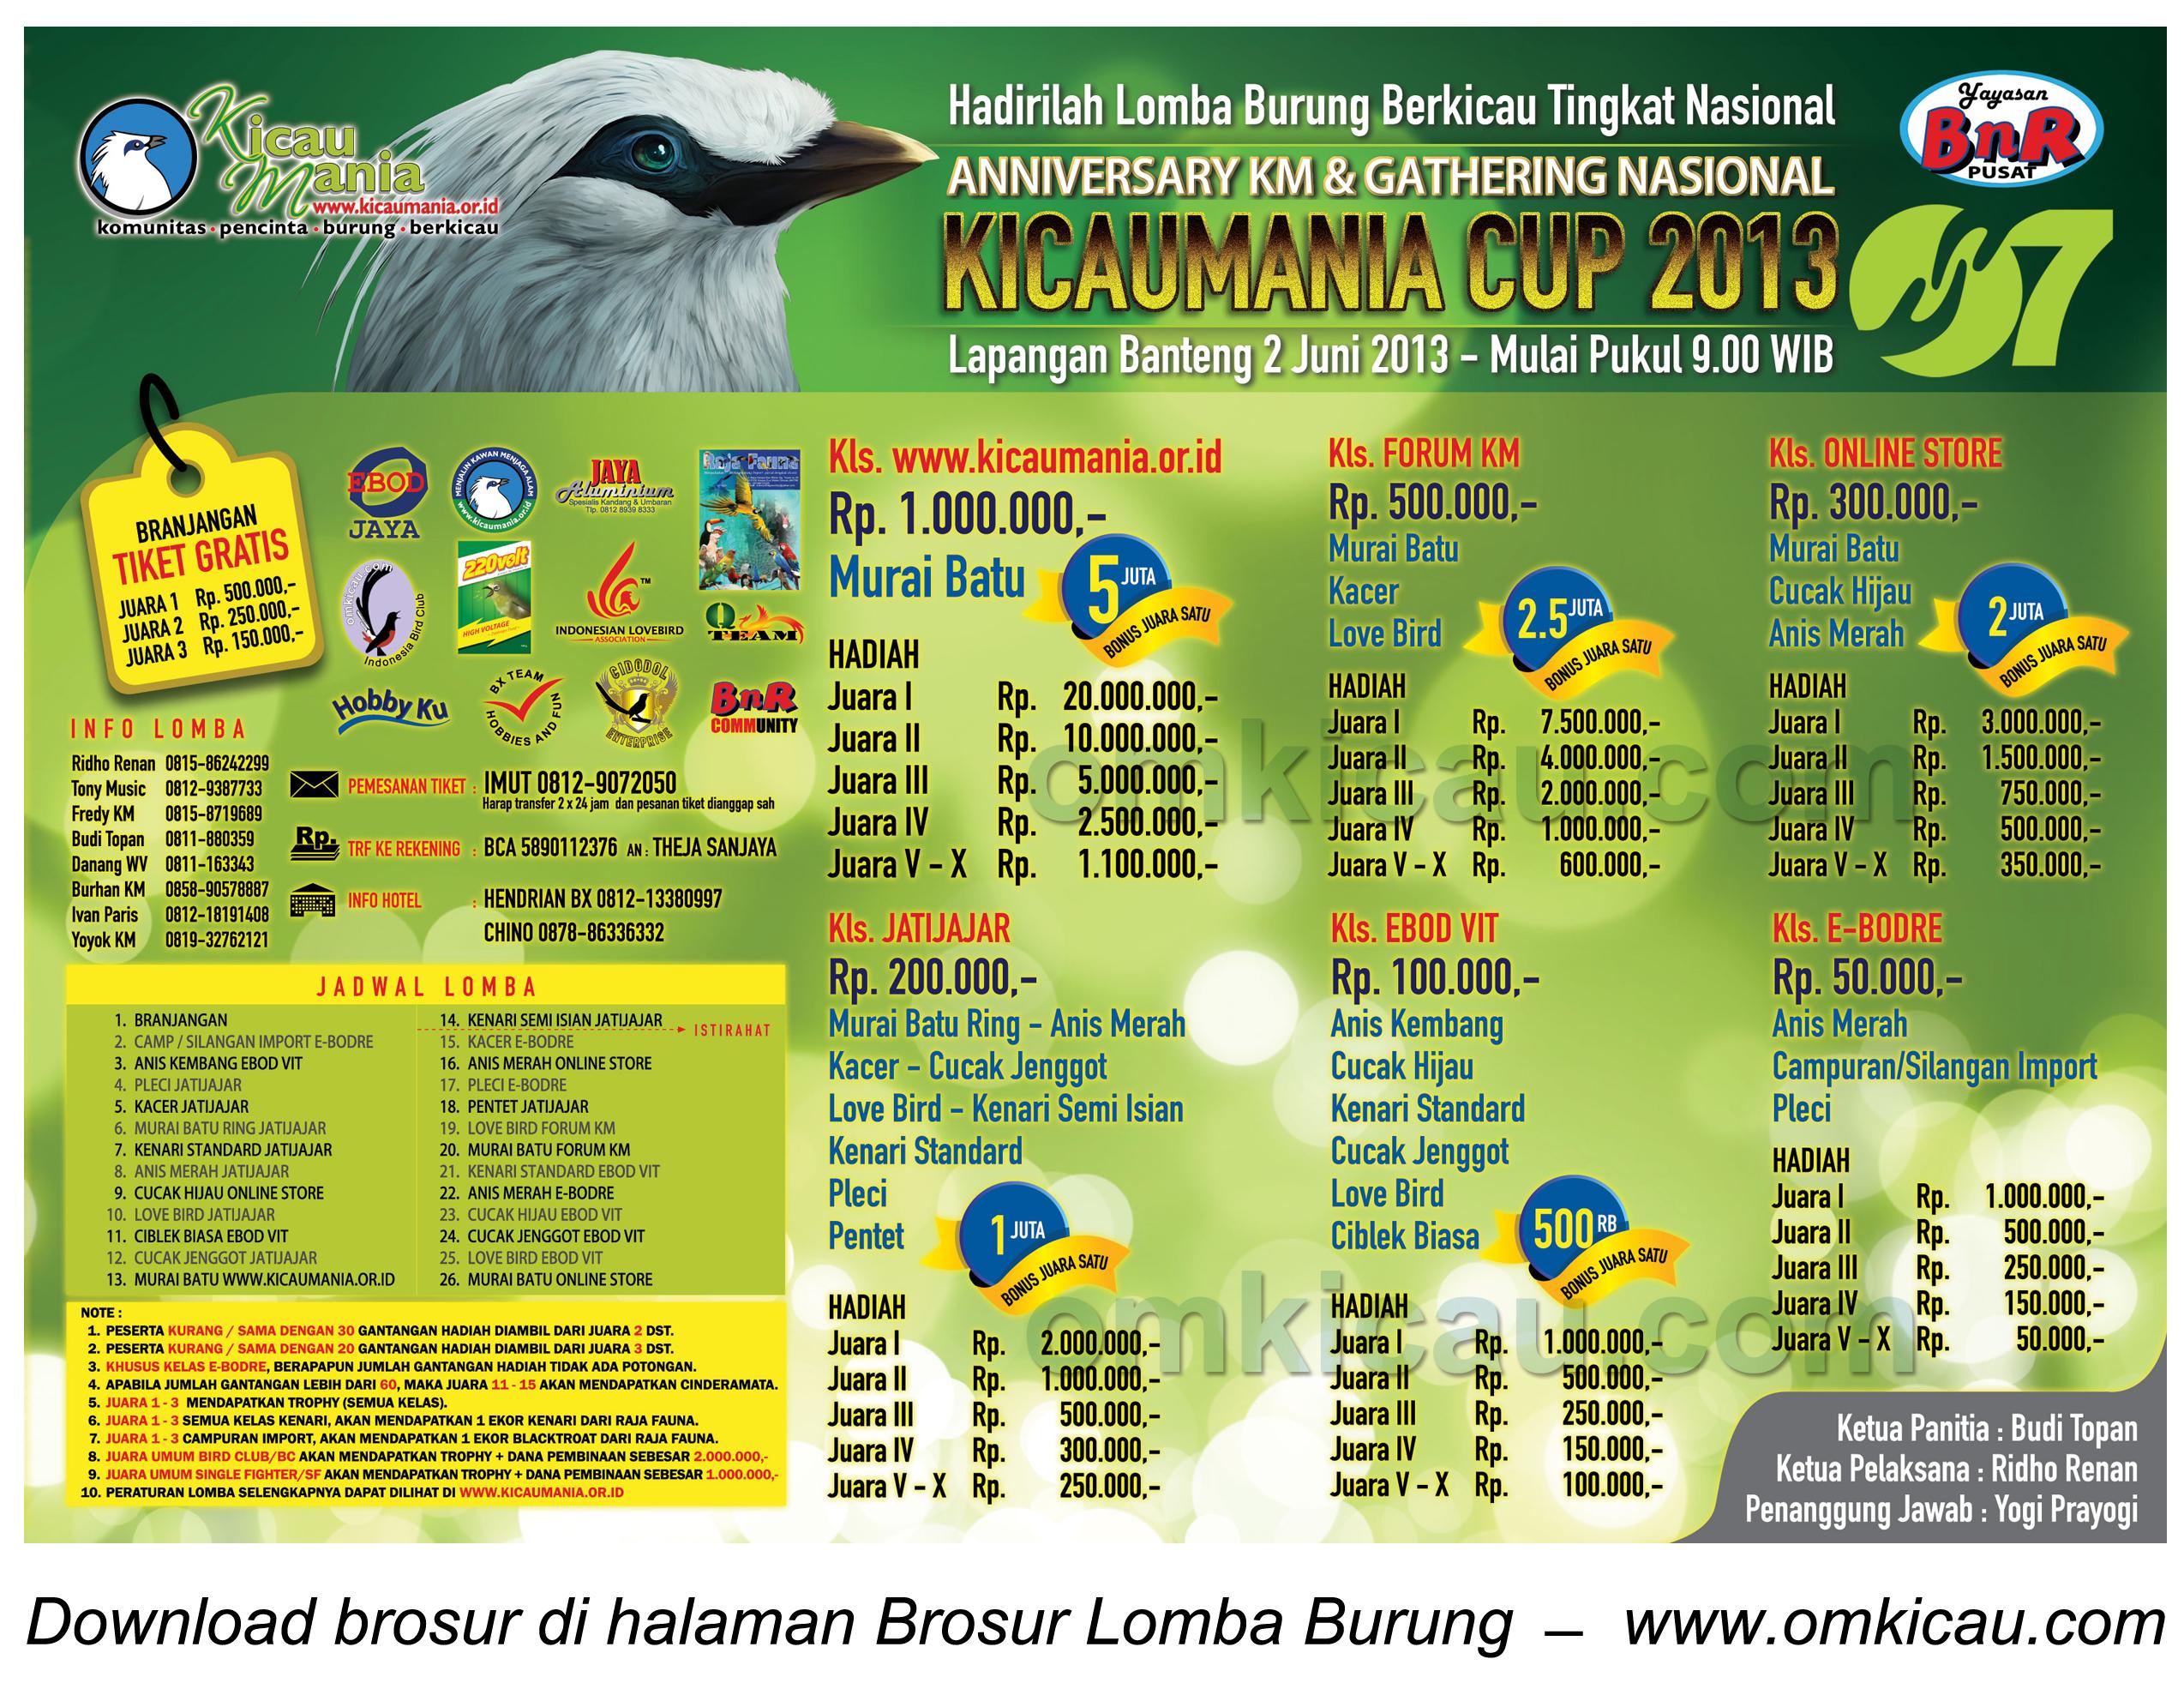 Brosur Lomba Kicaumania Cup - 2 Juni 2013